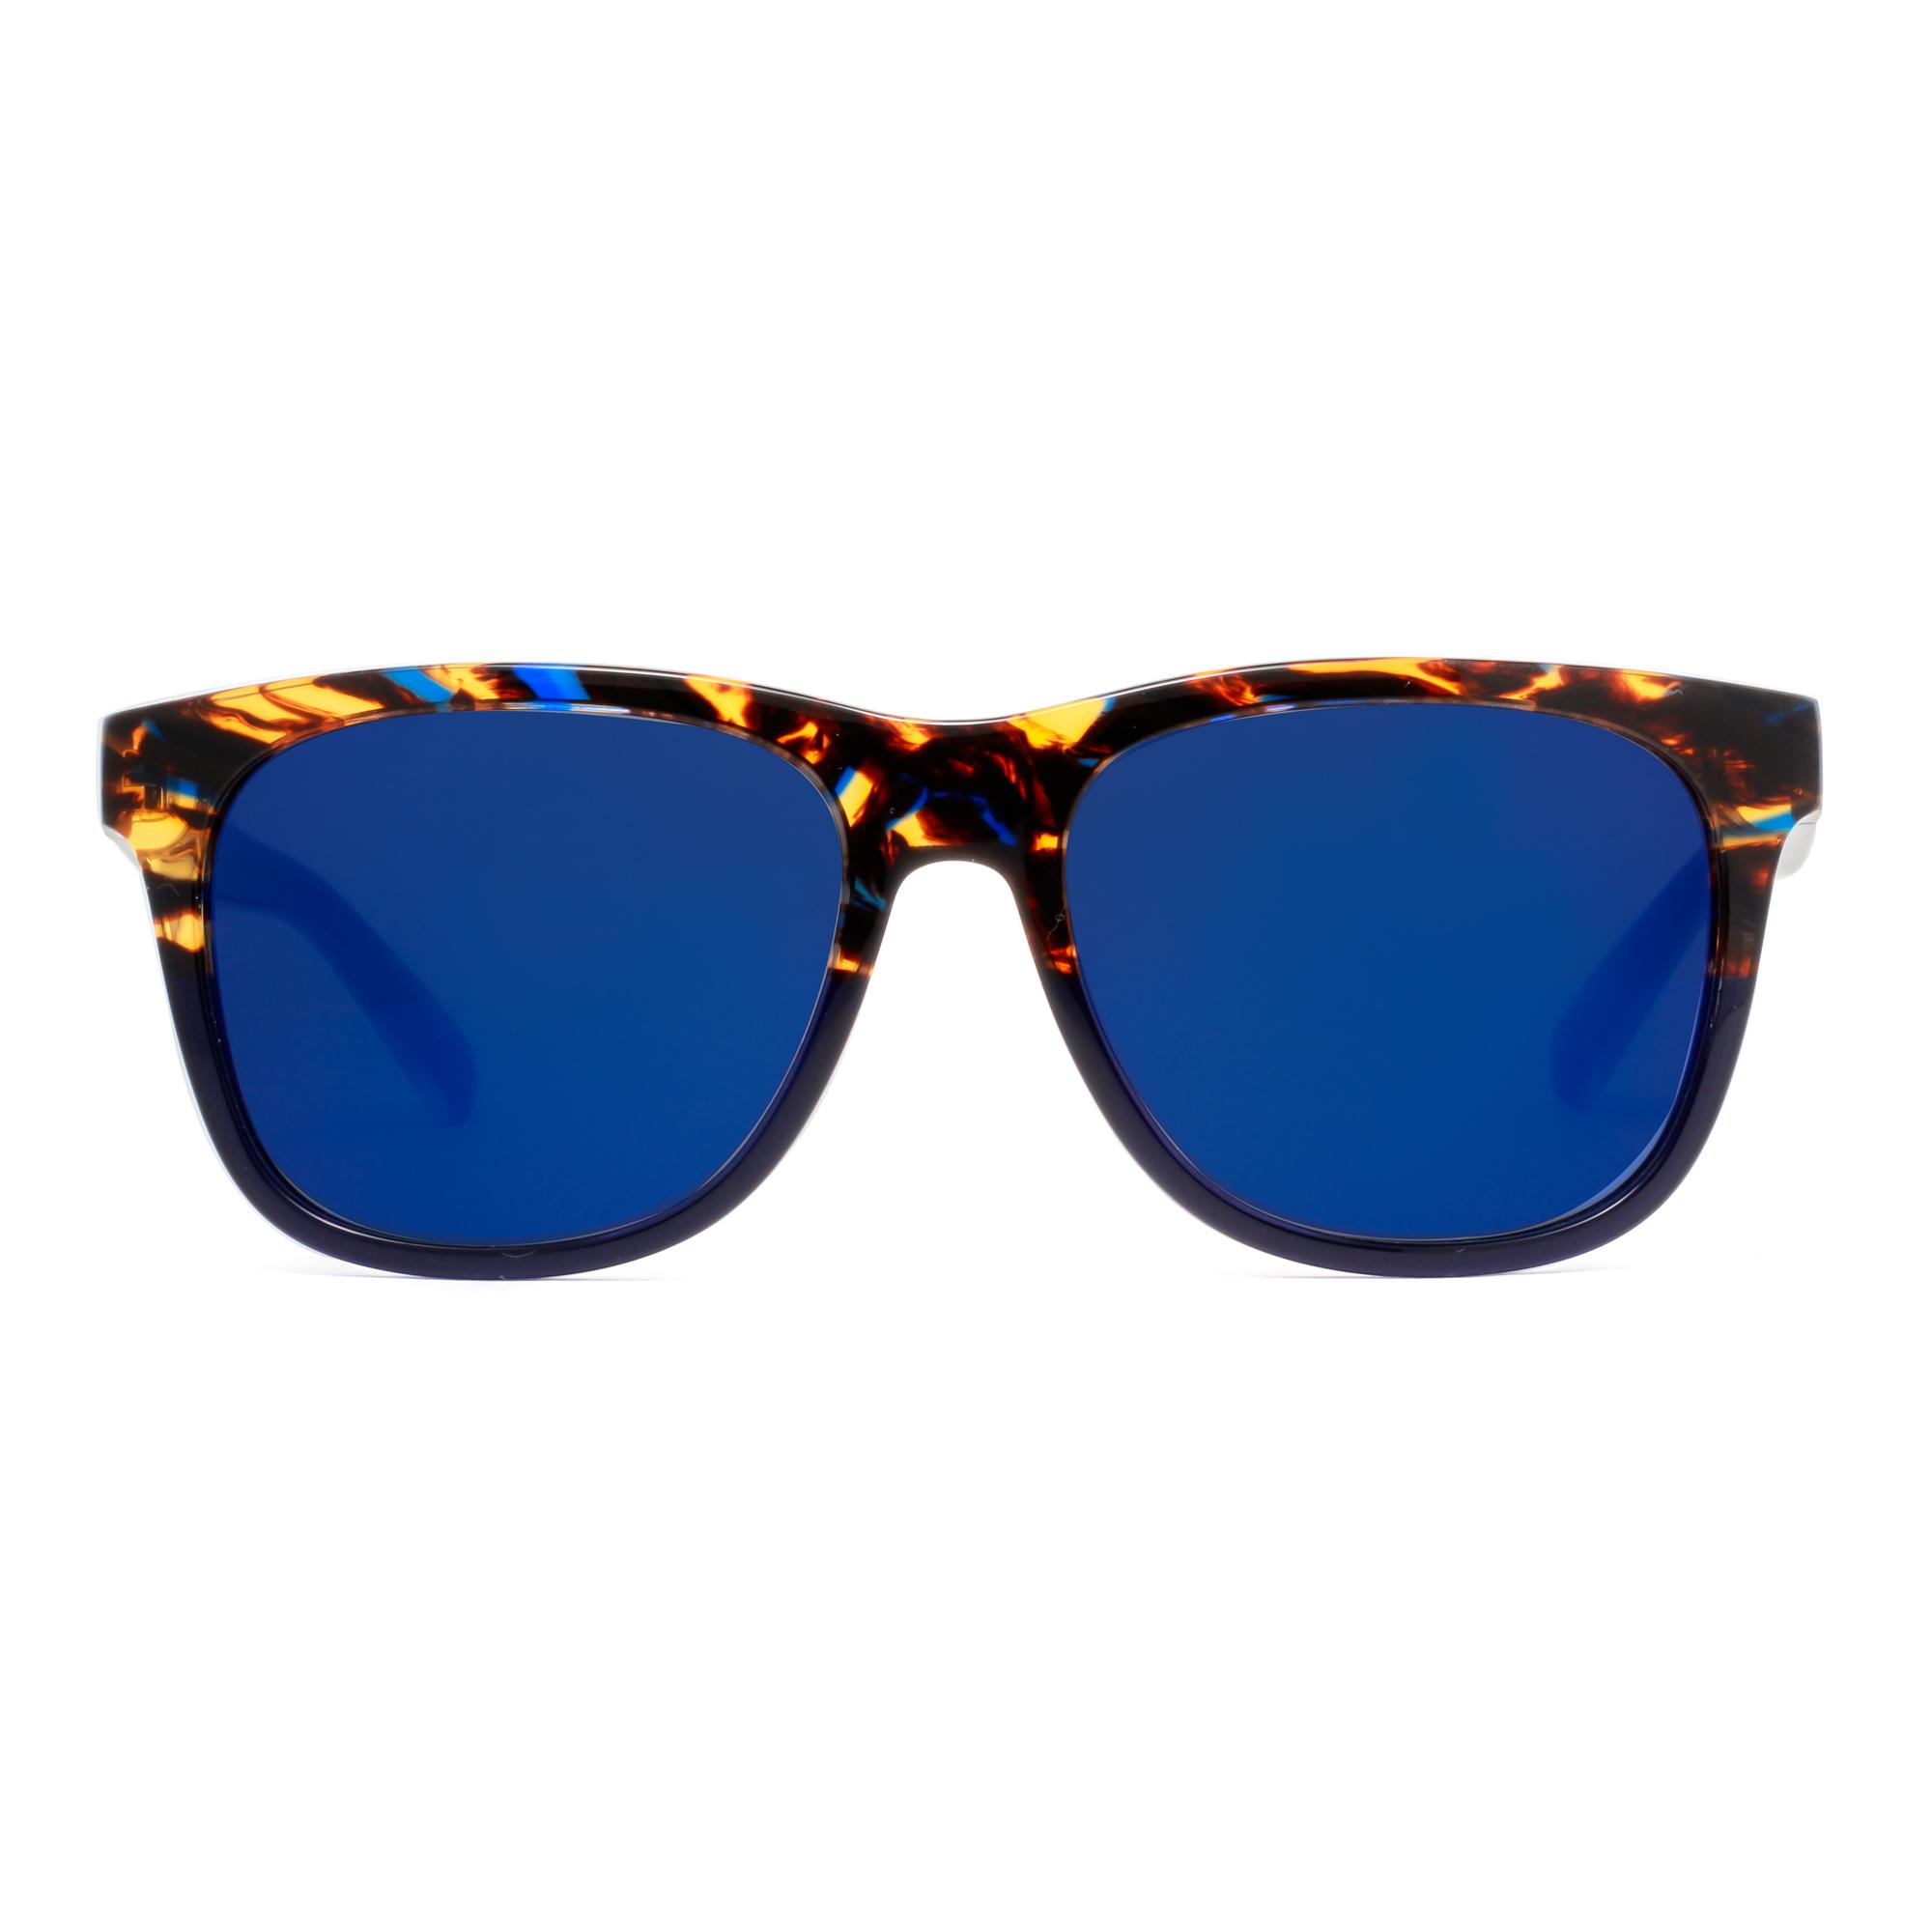 c2c3dce164 Marc by Marc Jacobs MMJ 360 N S Unisex Square Sunglasses